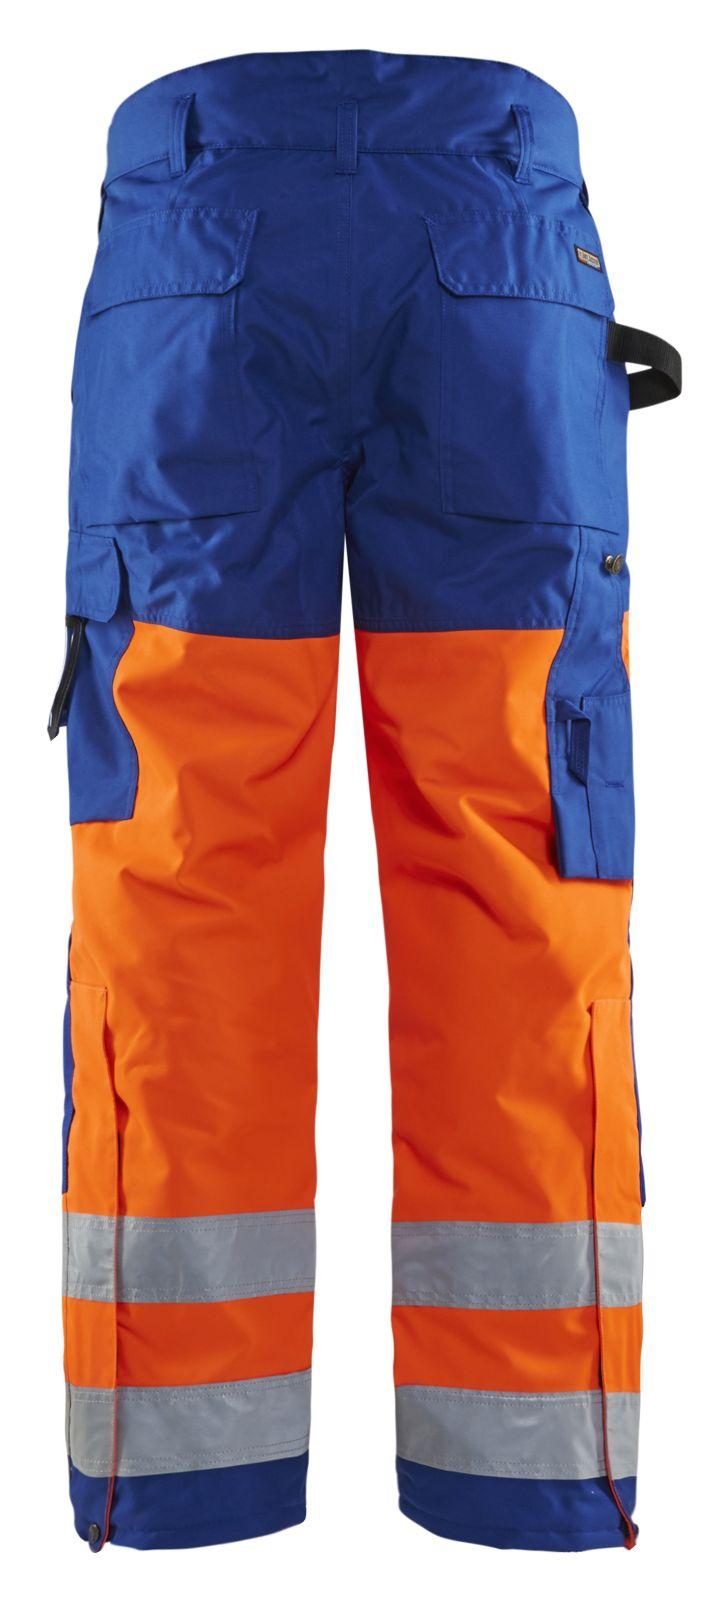 Blaklader Winterbroeken 18831997 High Vis oranje-korenblauw(5385)